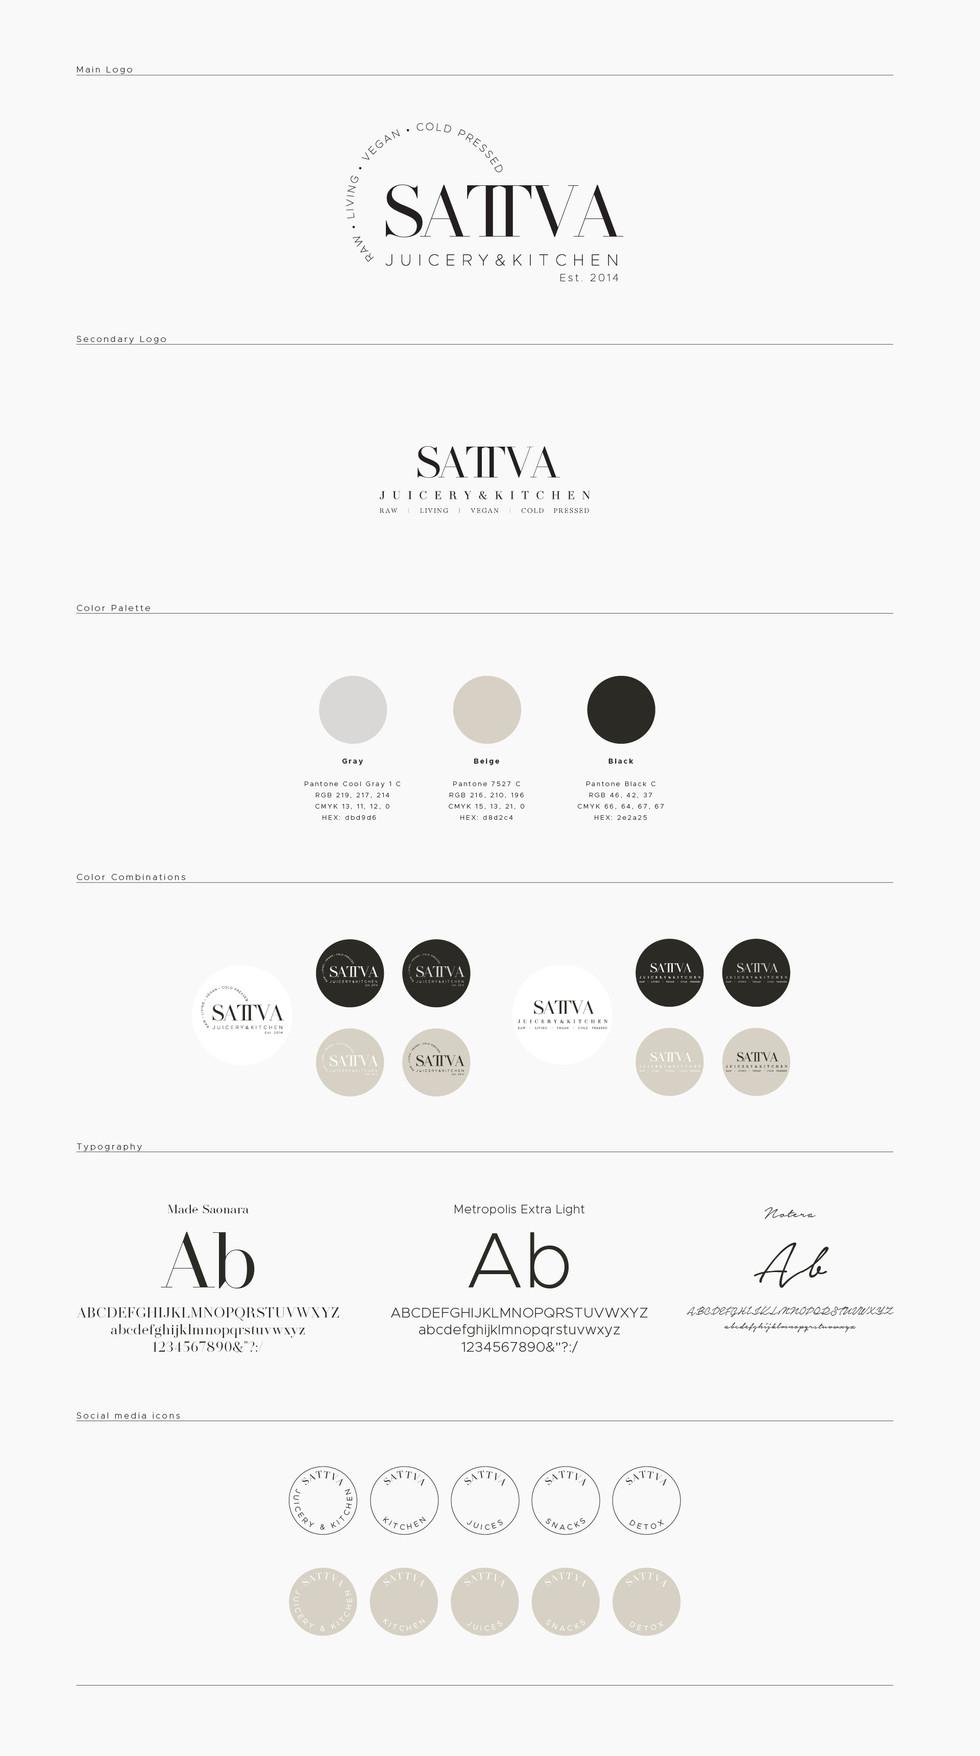 Sattva-brand-guidelines.jpg